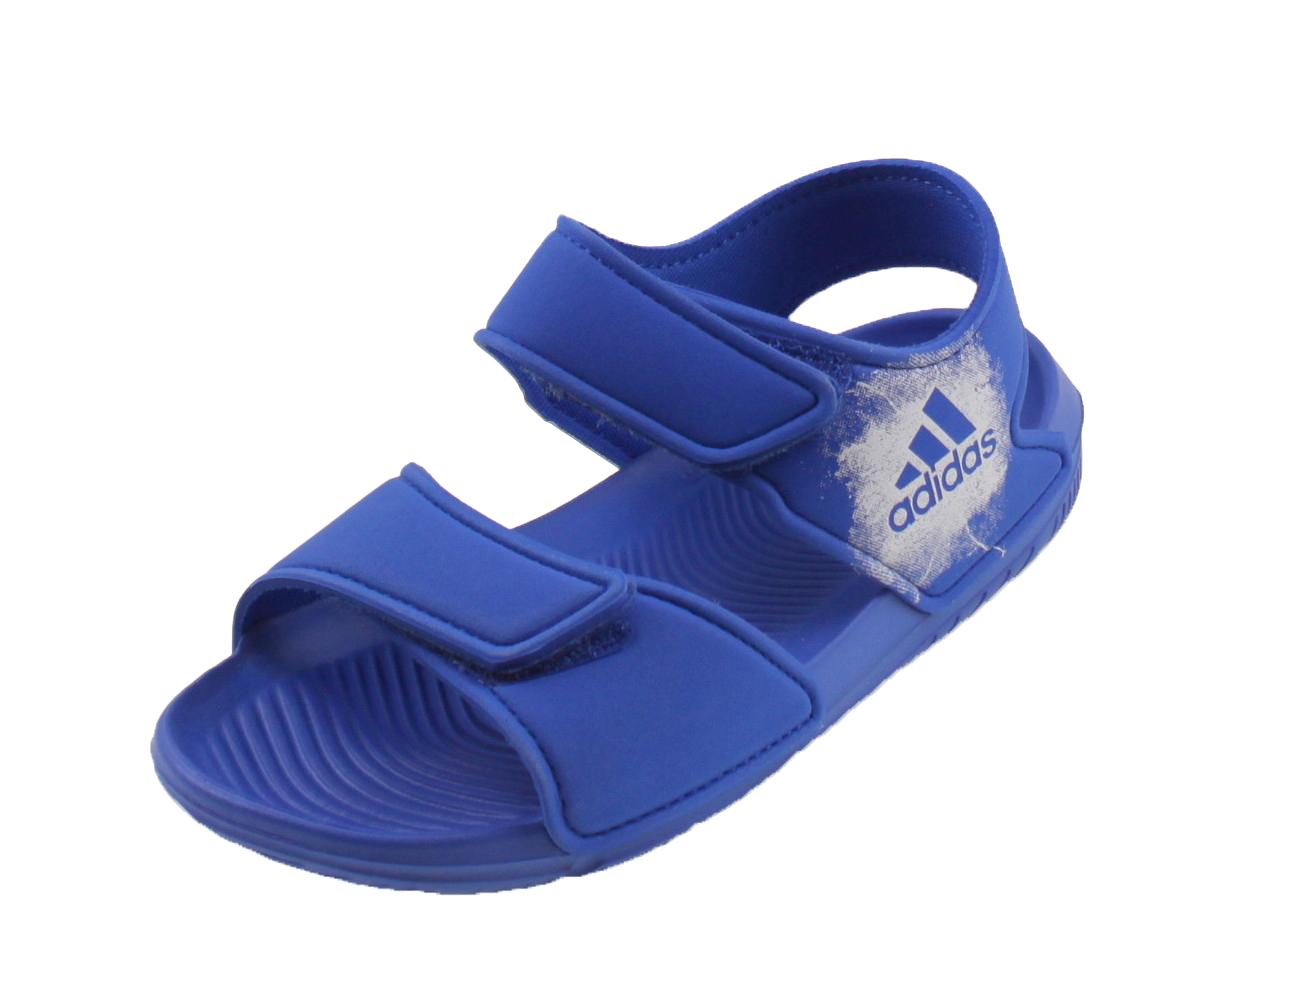 d13811db61b Adidas Altaswim sandalen BLAUW online kopen bij Sportpaleis.